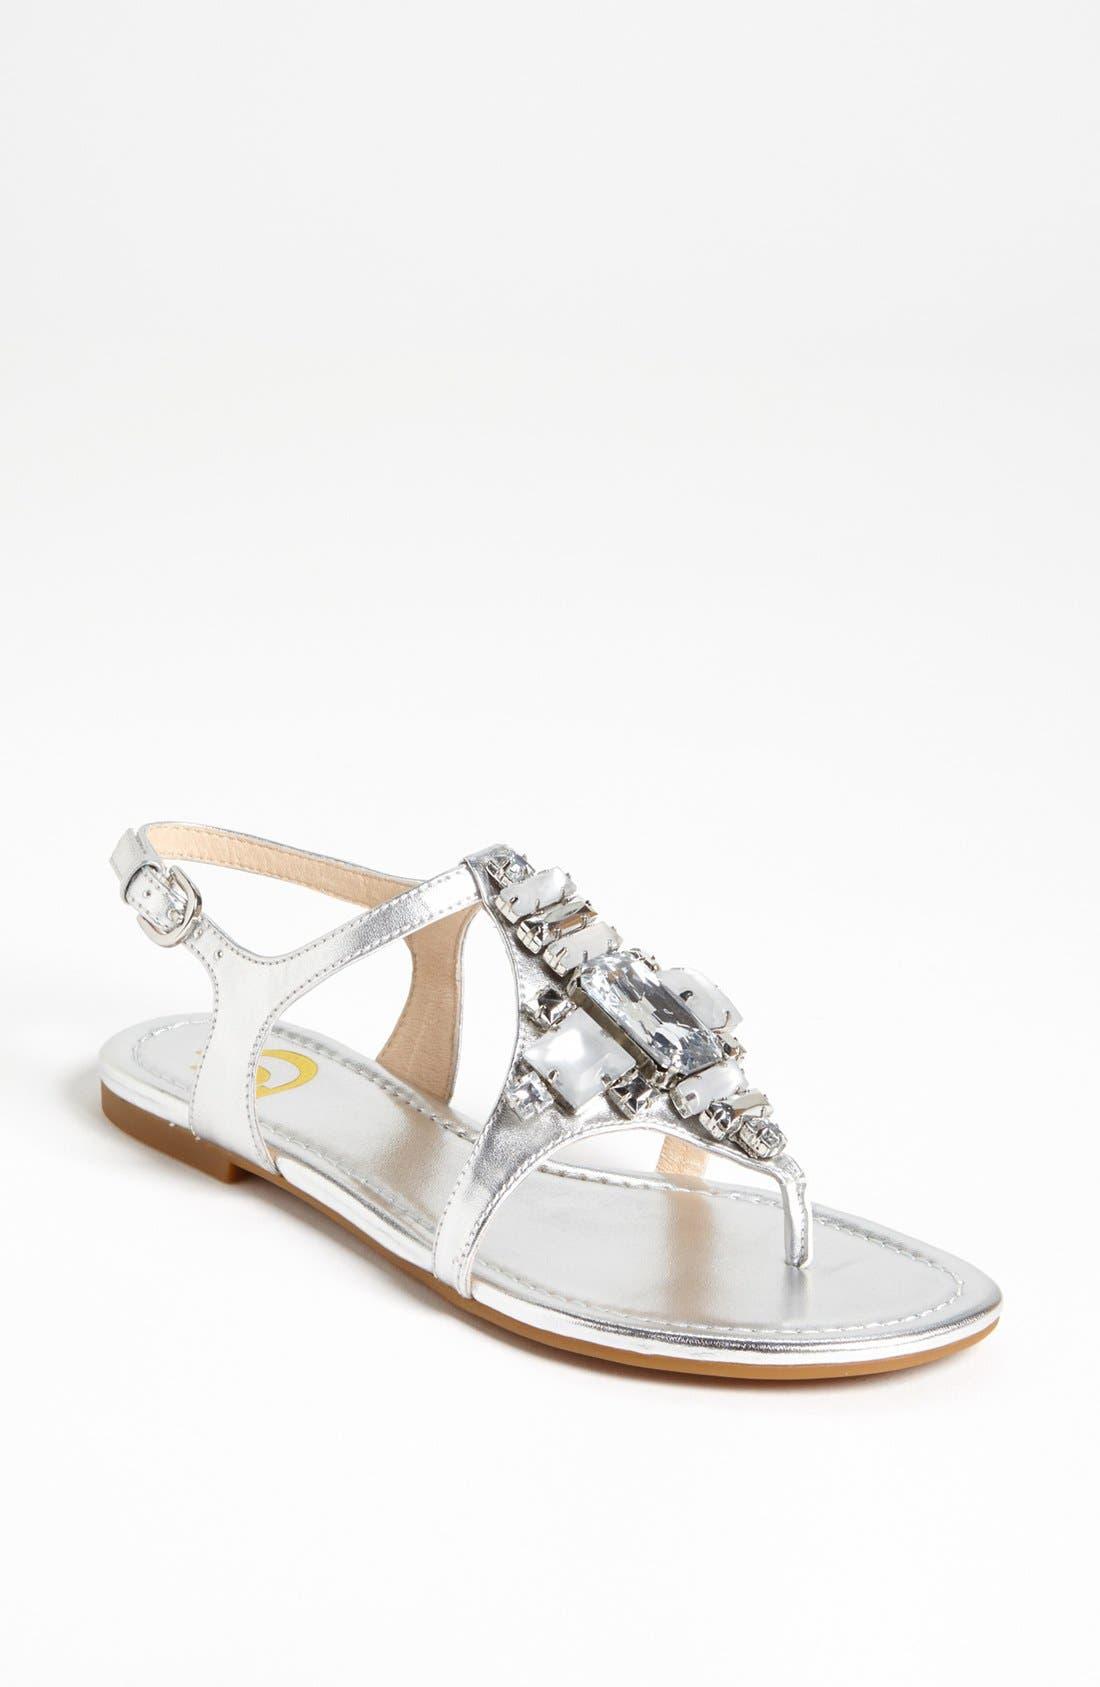 Alternate Image 1 Selected - Joan & David 'Kadison' Sandal (Special Purchase)